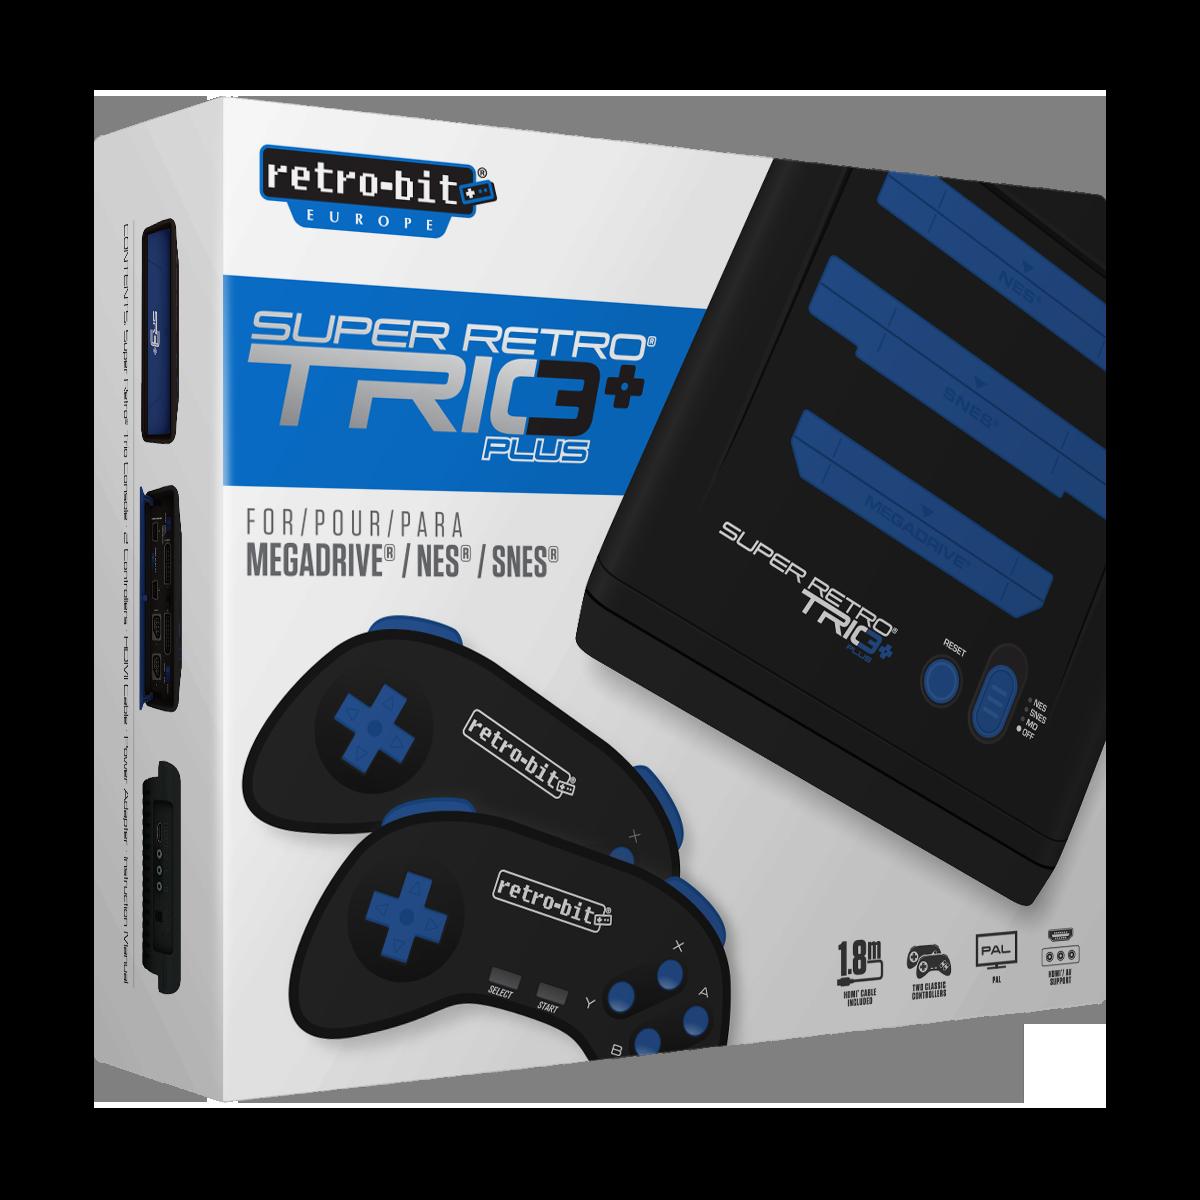 Review: Super RetroTRIO Plus (Hardware) | GBAtemp net - The